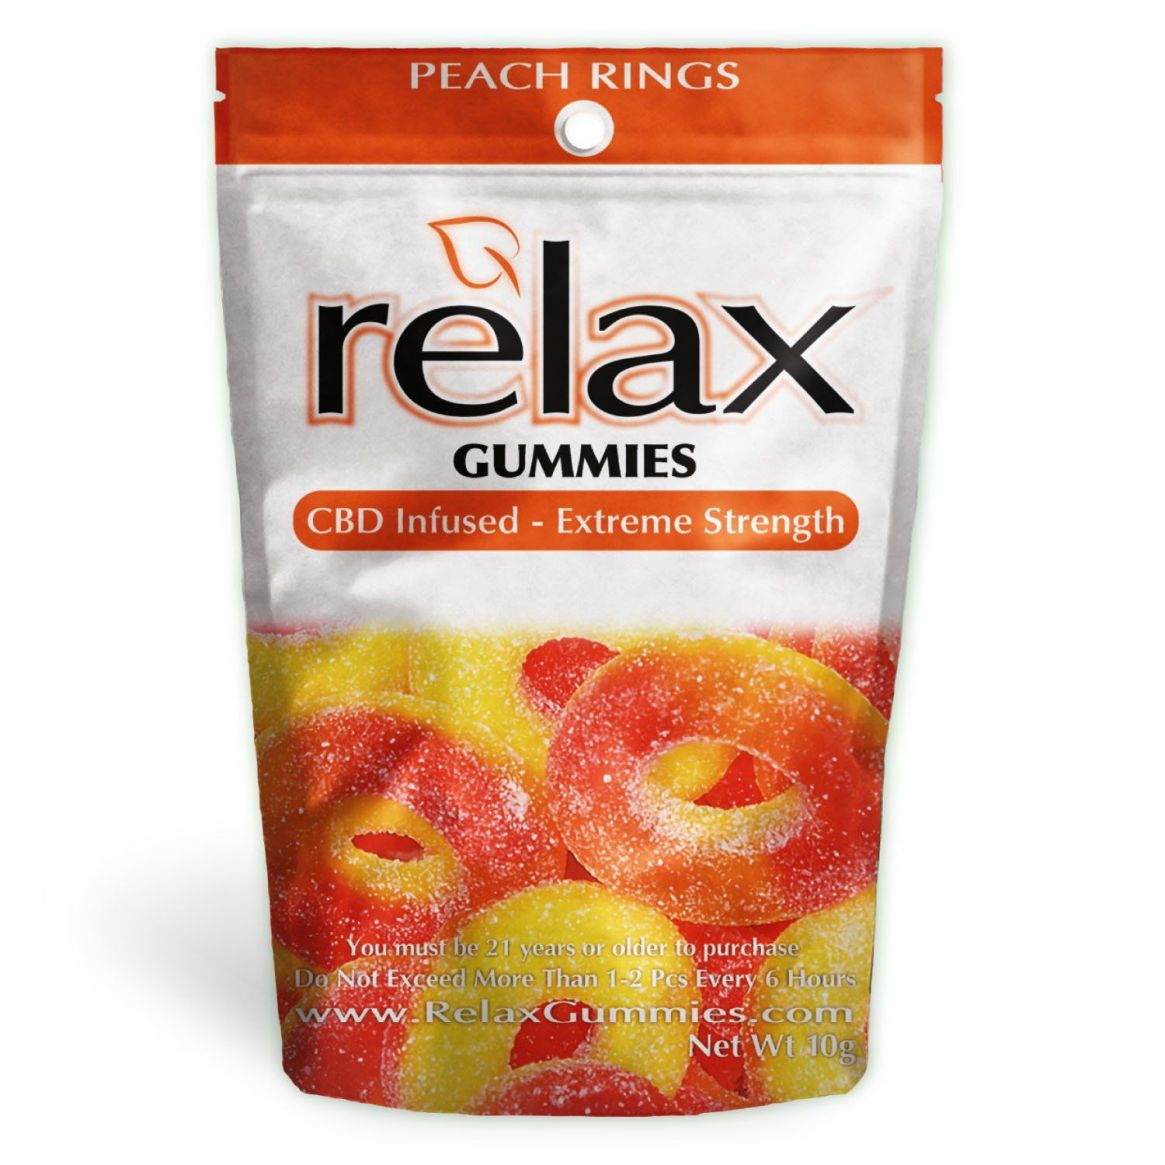 1245428711465 new peach rings